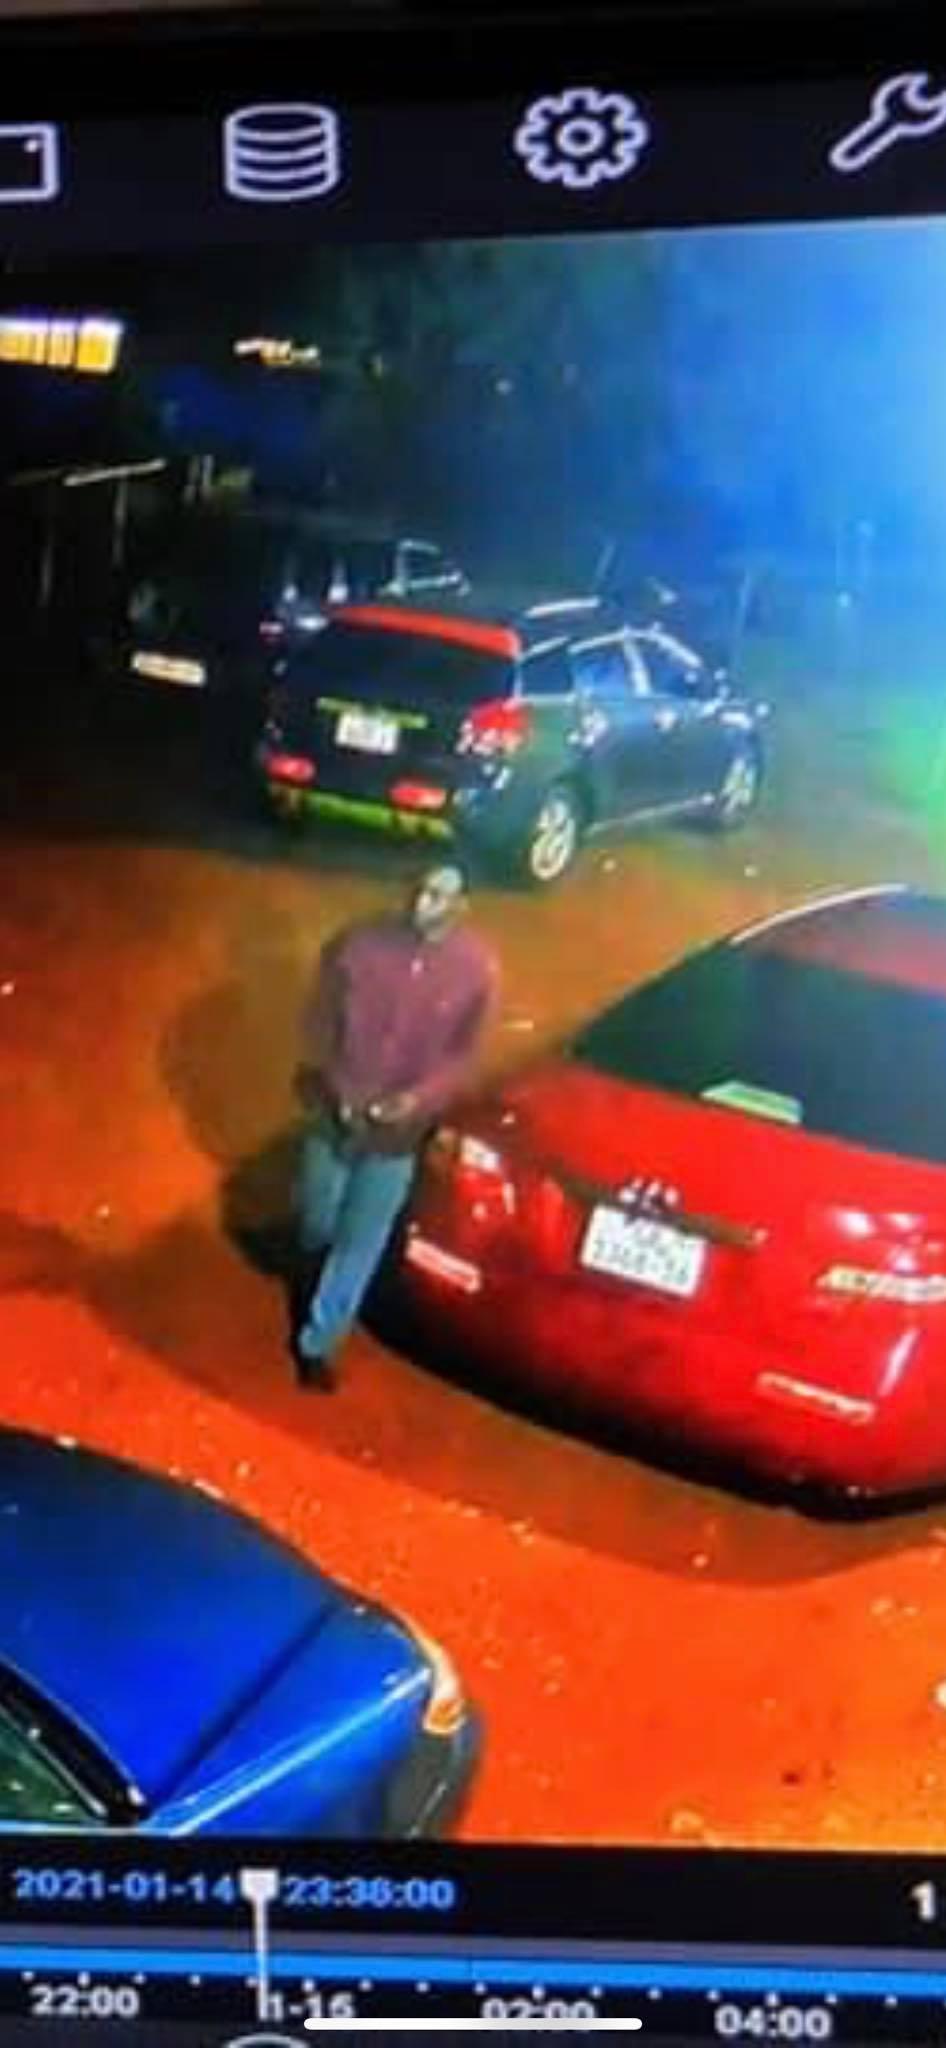 Journalist Abdul Hayi Moomen shares CCTV footage of the man that broke into his car